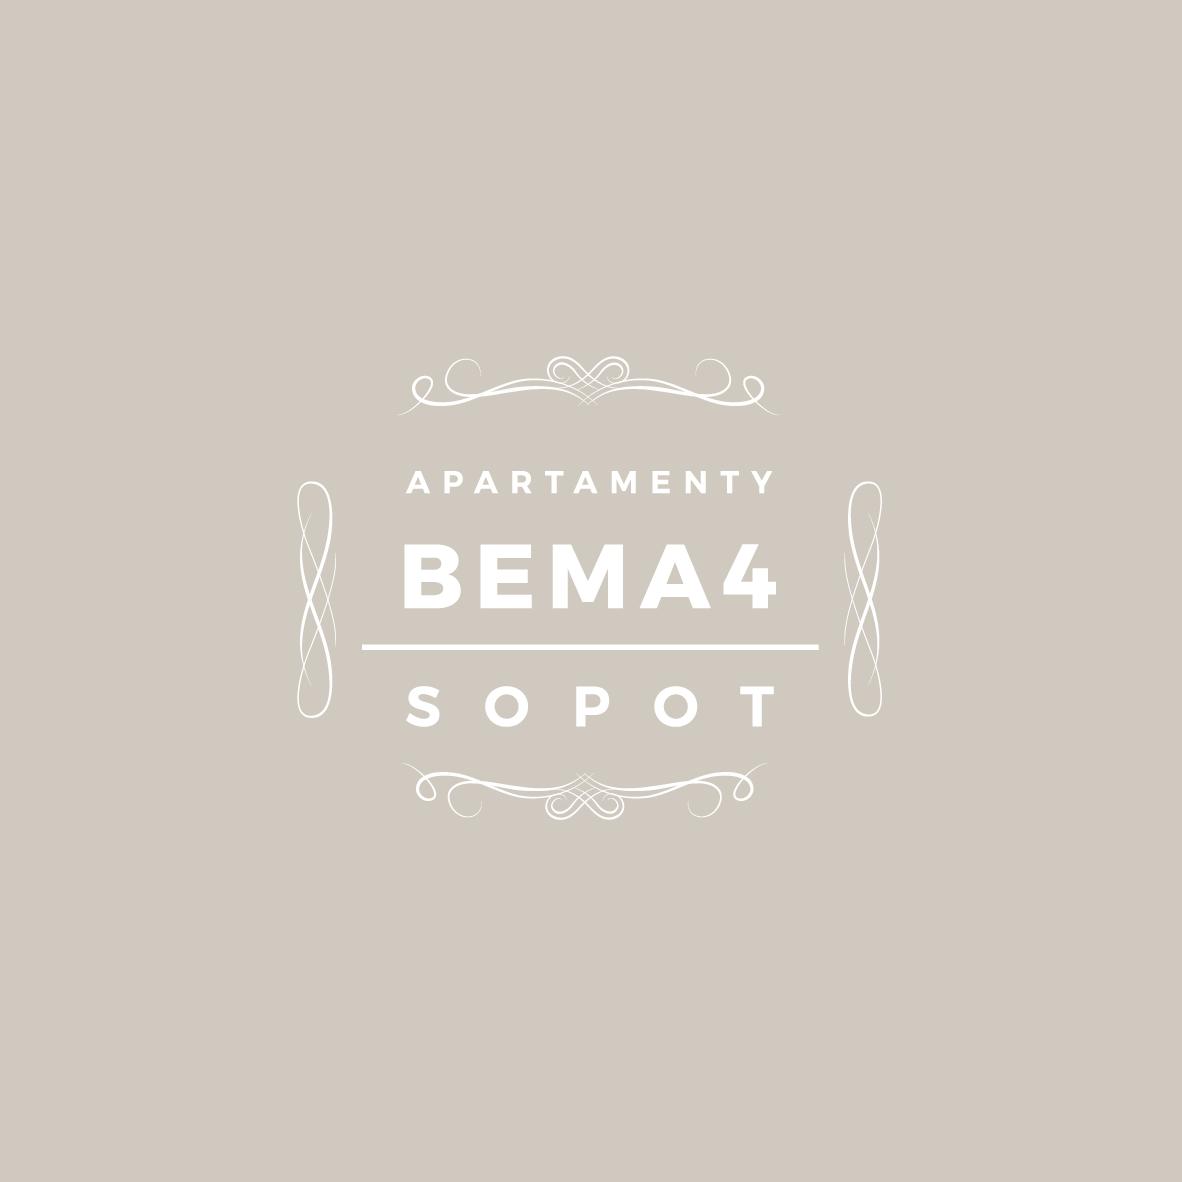 Apartamenty Bema4